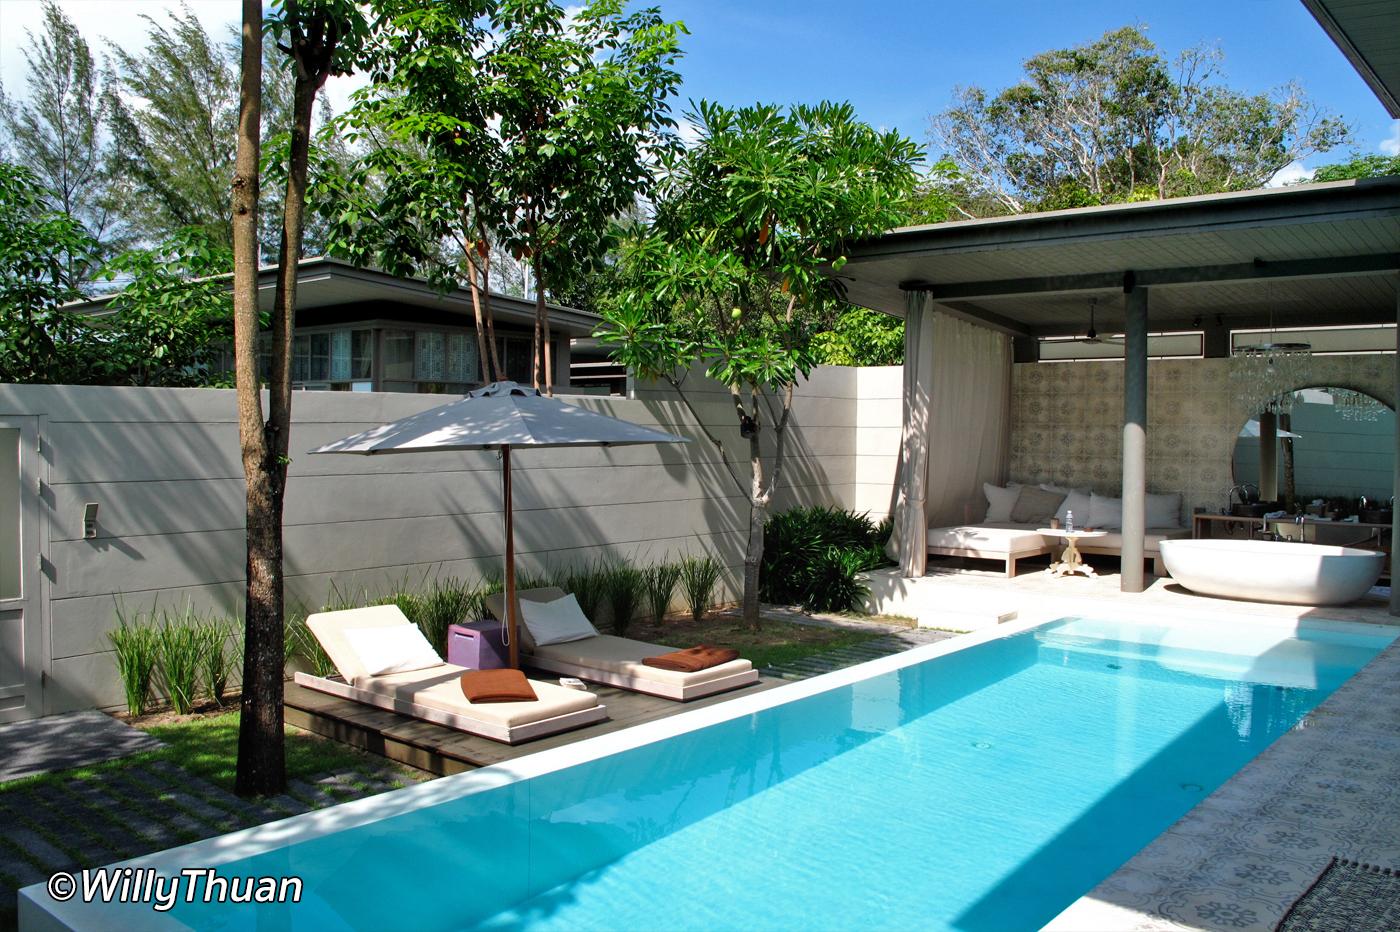 Sala Phuket Resort on Mai Khao Beach